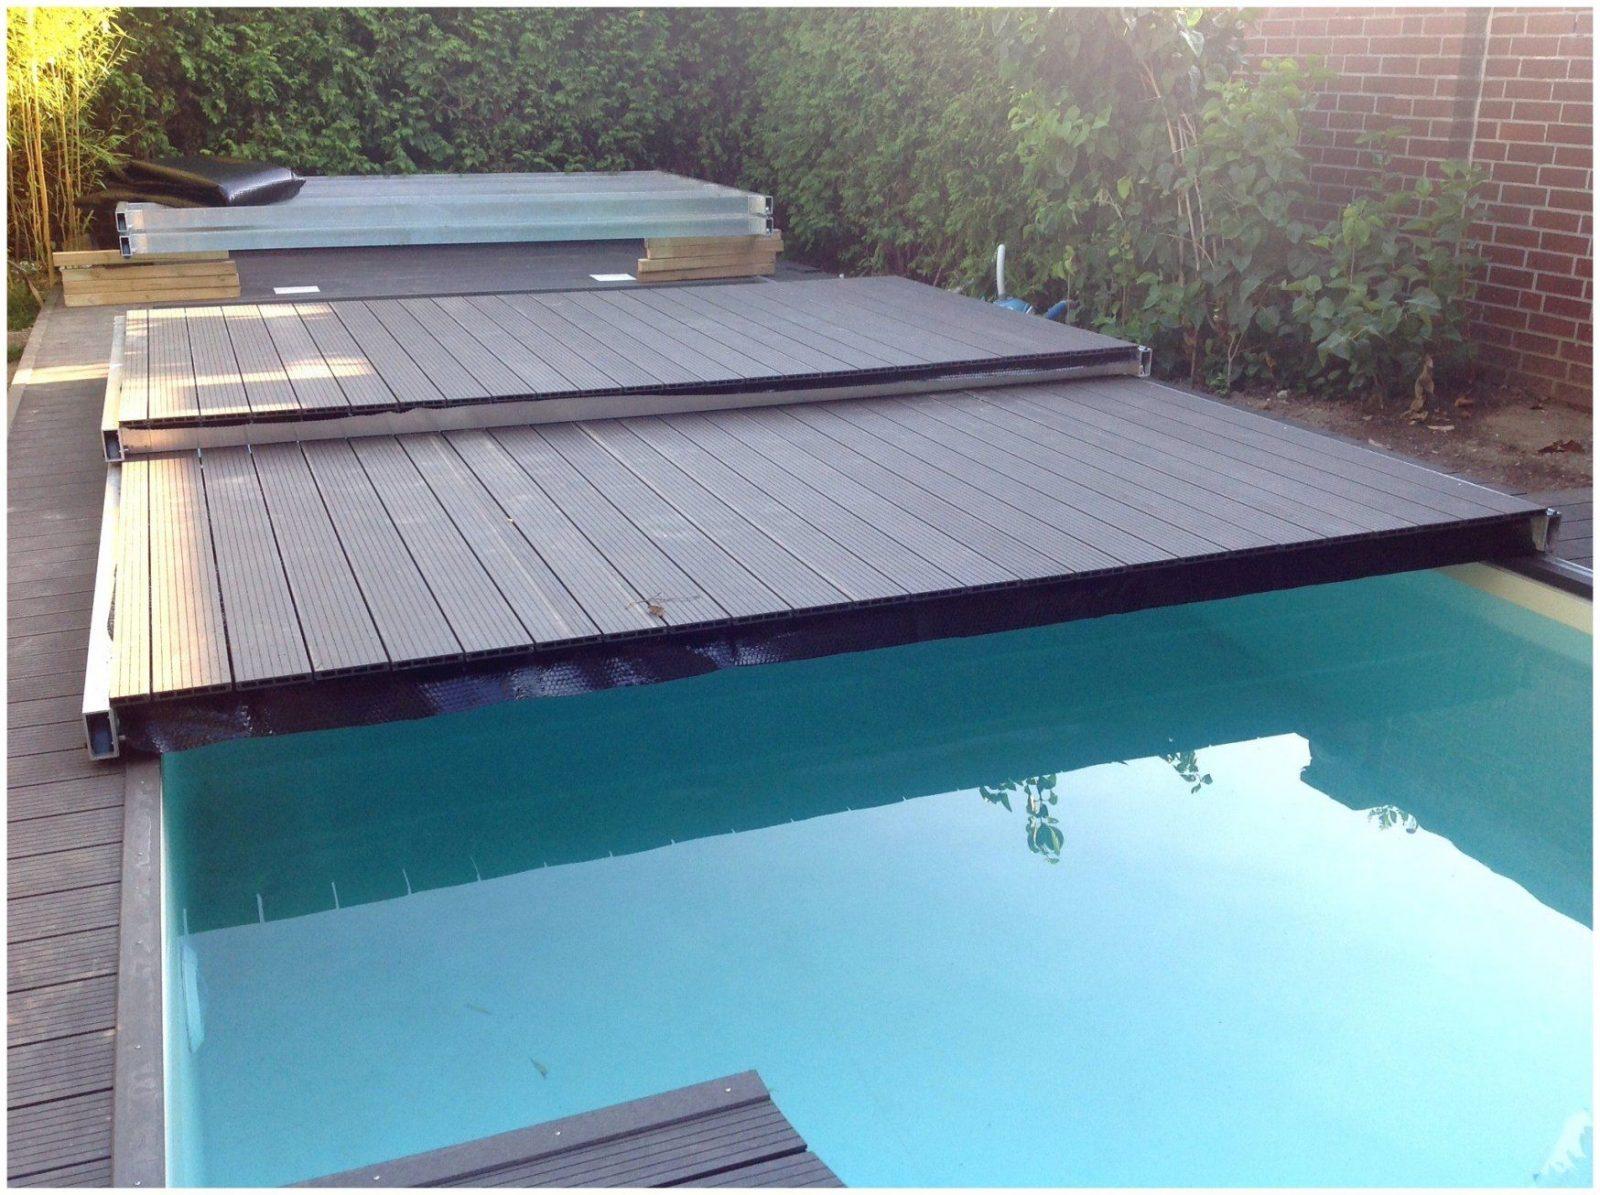 Pool Diy Paletten Pool Bauen Aus Europaletten